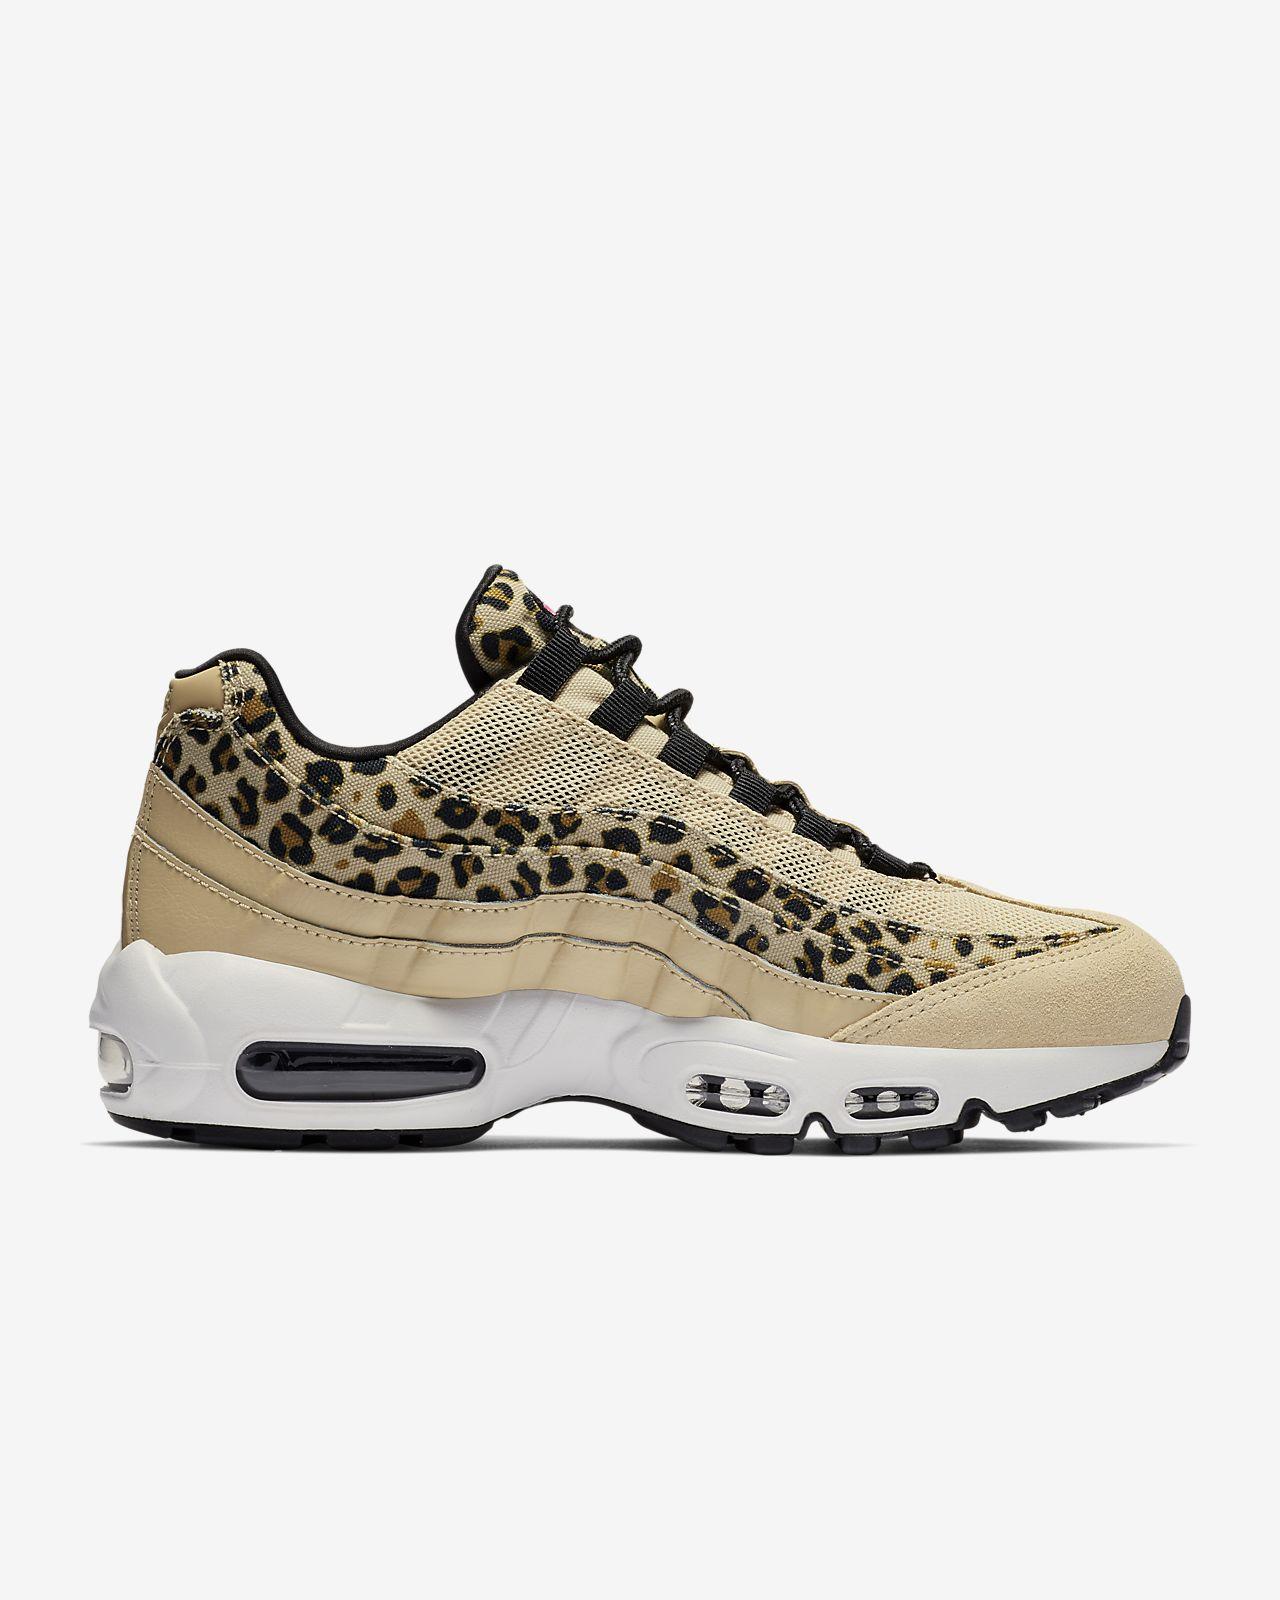 buy popular 4bb04 afb58 ... Nike Air Max 95 Premium Animal Women s Shoe